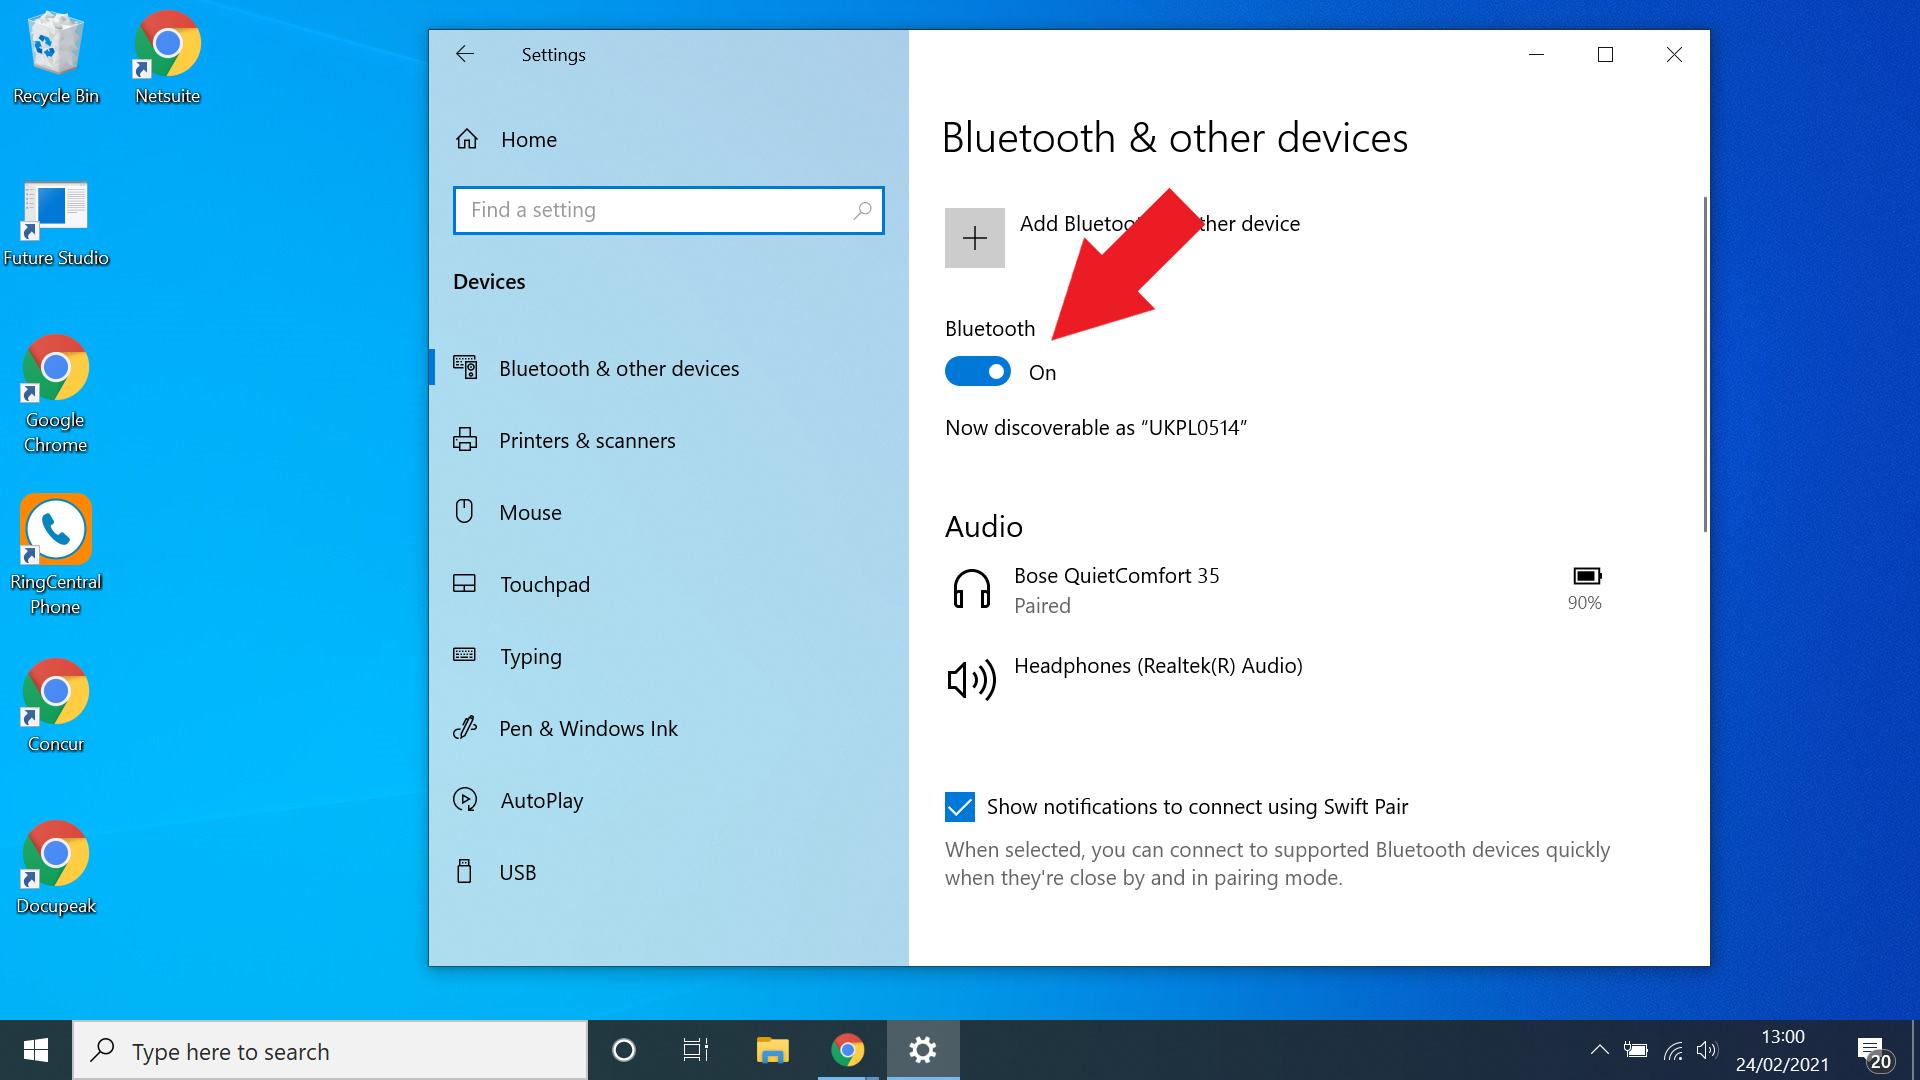 cara mengaktifkan bluetooth untuk windows 10 - aktifkan bluetooth dari menu